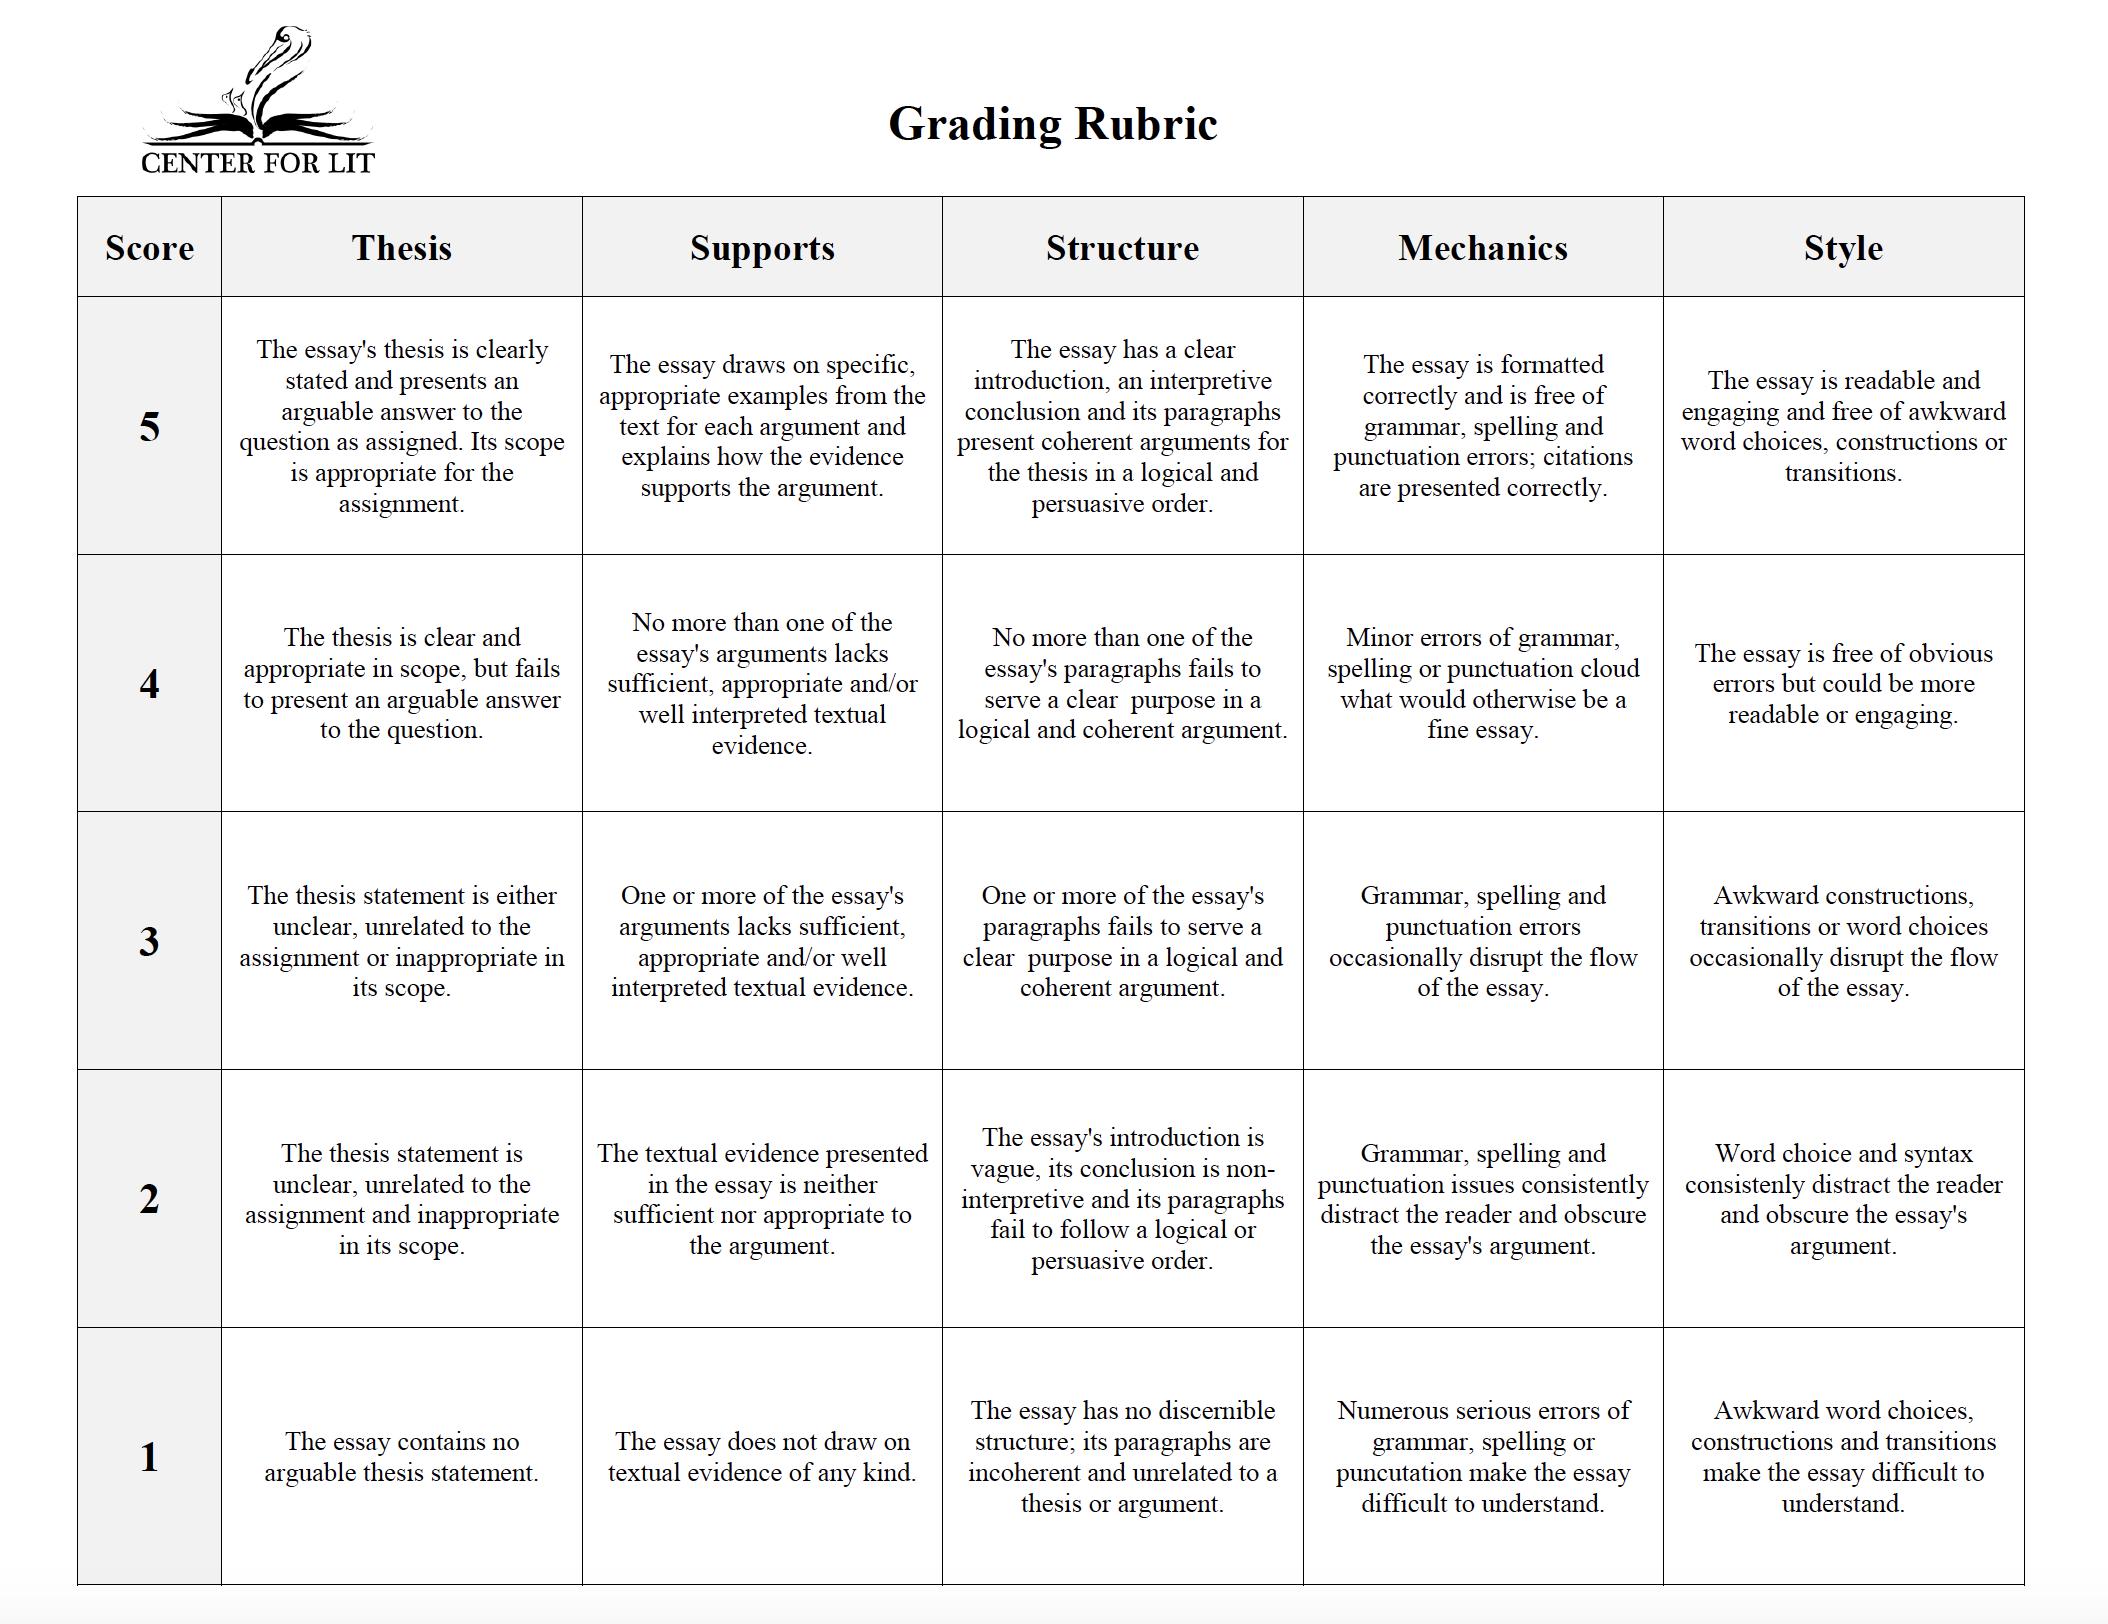 5_fold_grading_rubric.png